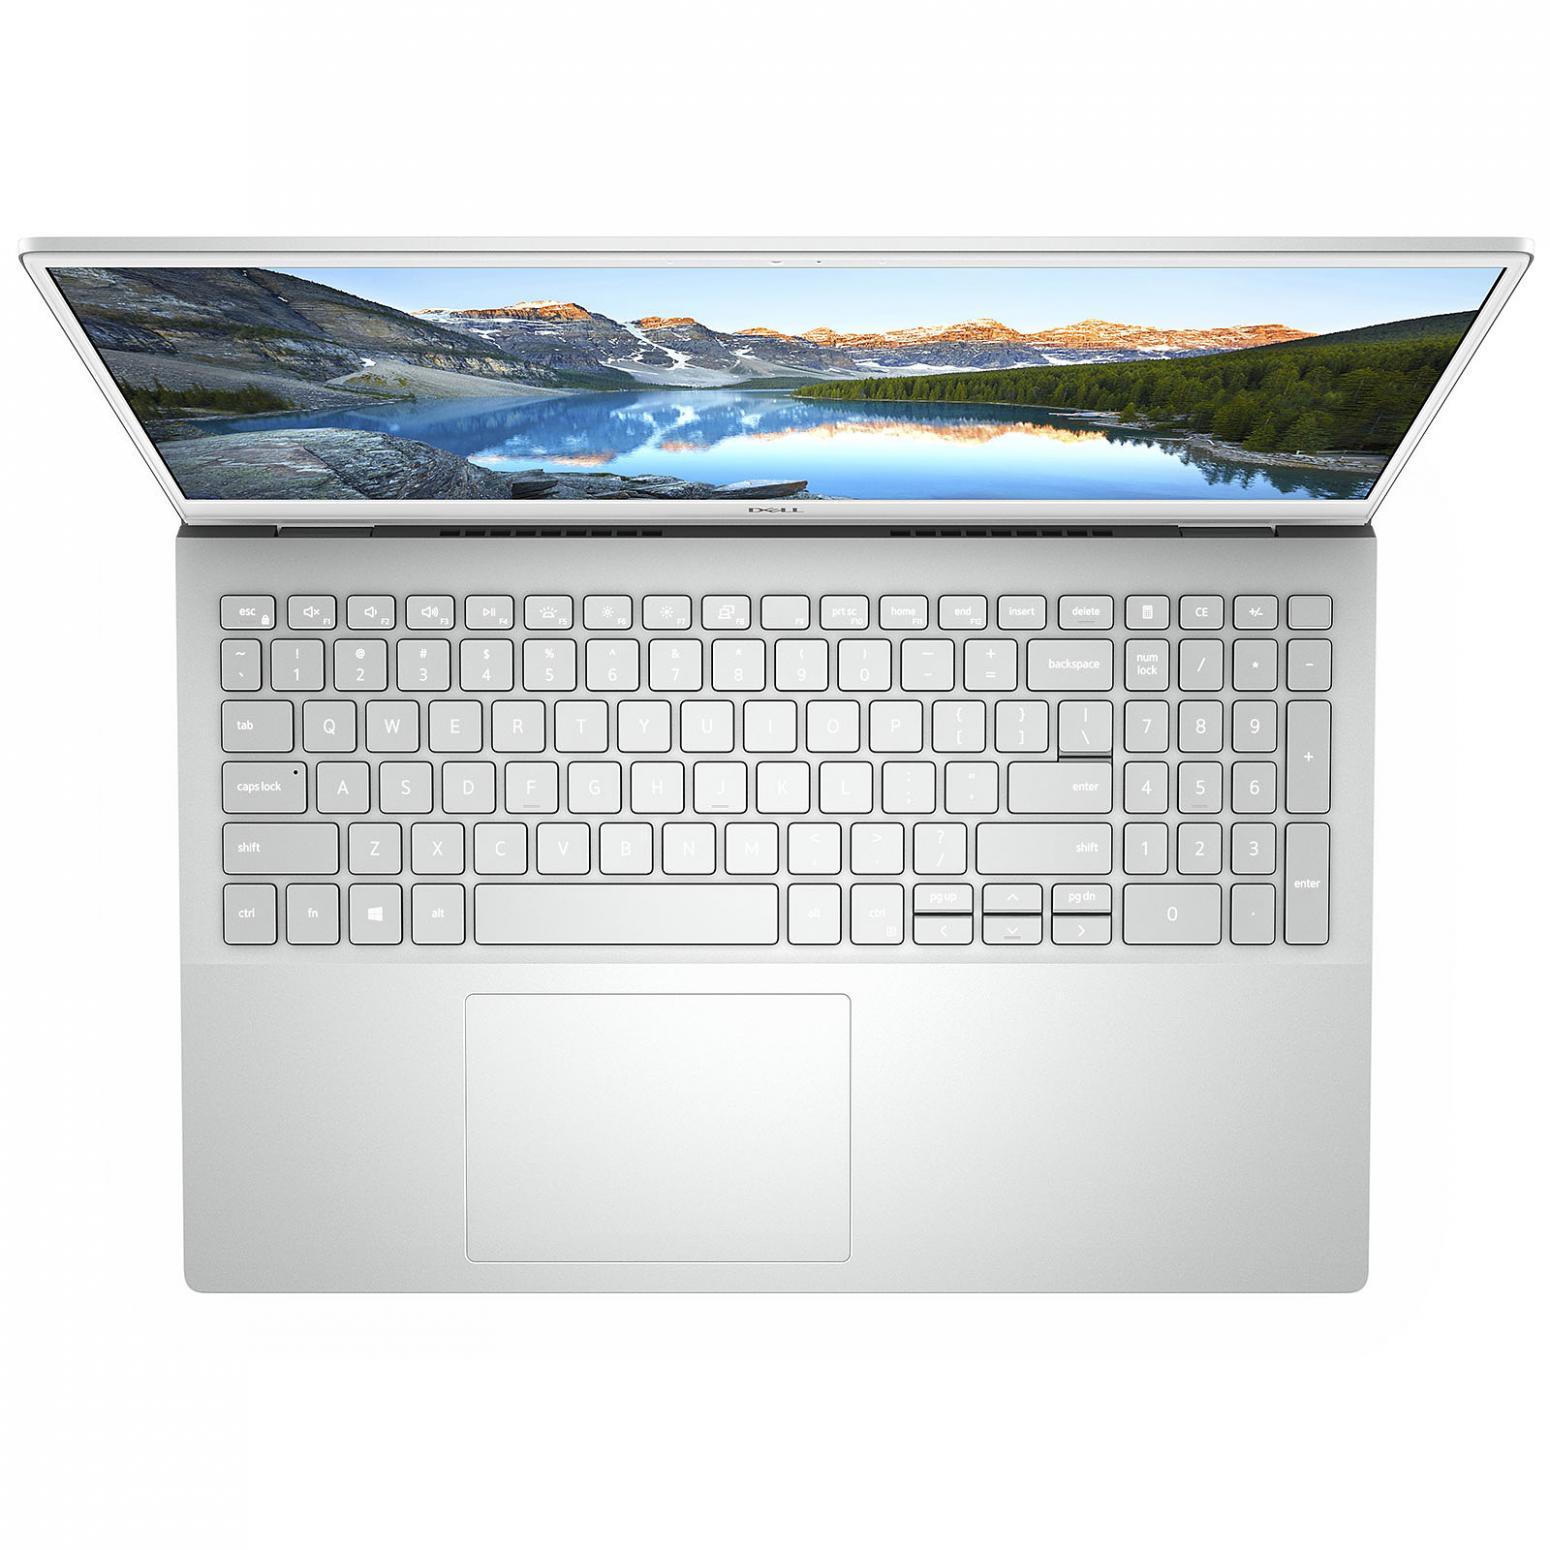 Ordinateur portable Dell Inspiron 15 5502 Argent - Core i5, SSD 256 Go - photo 2